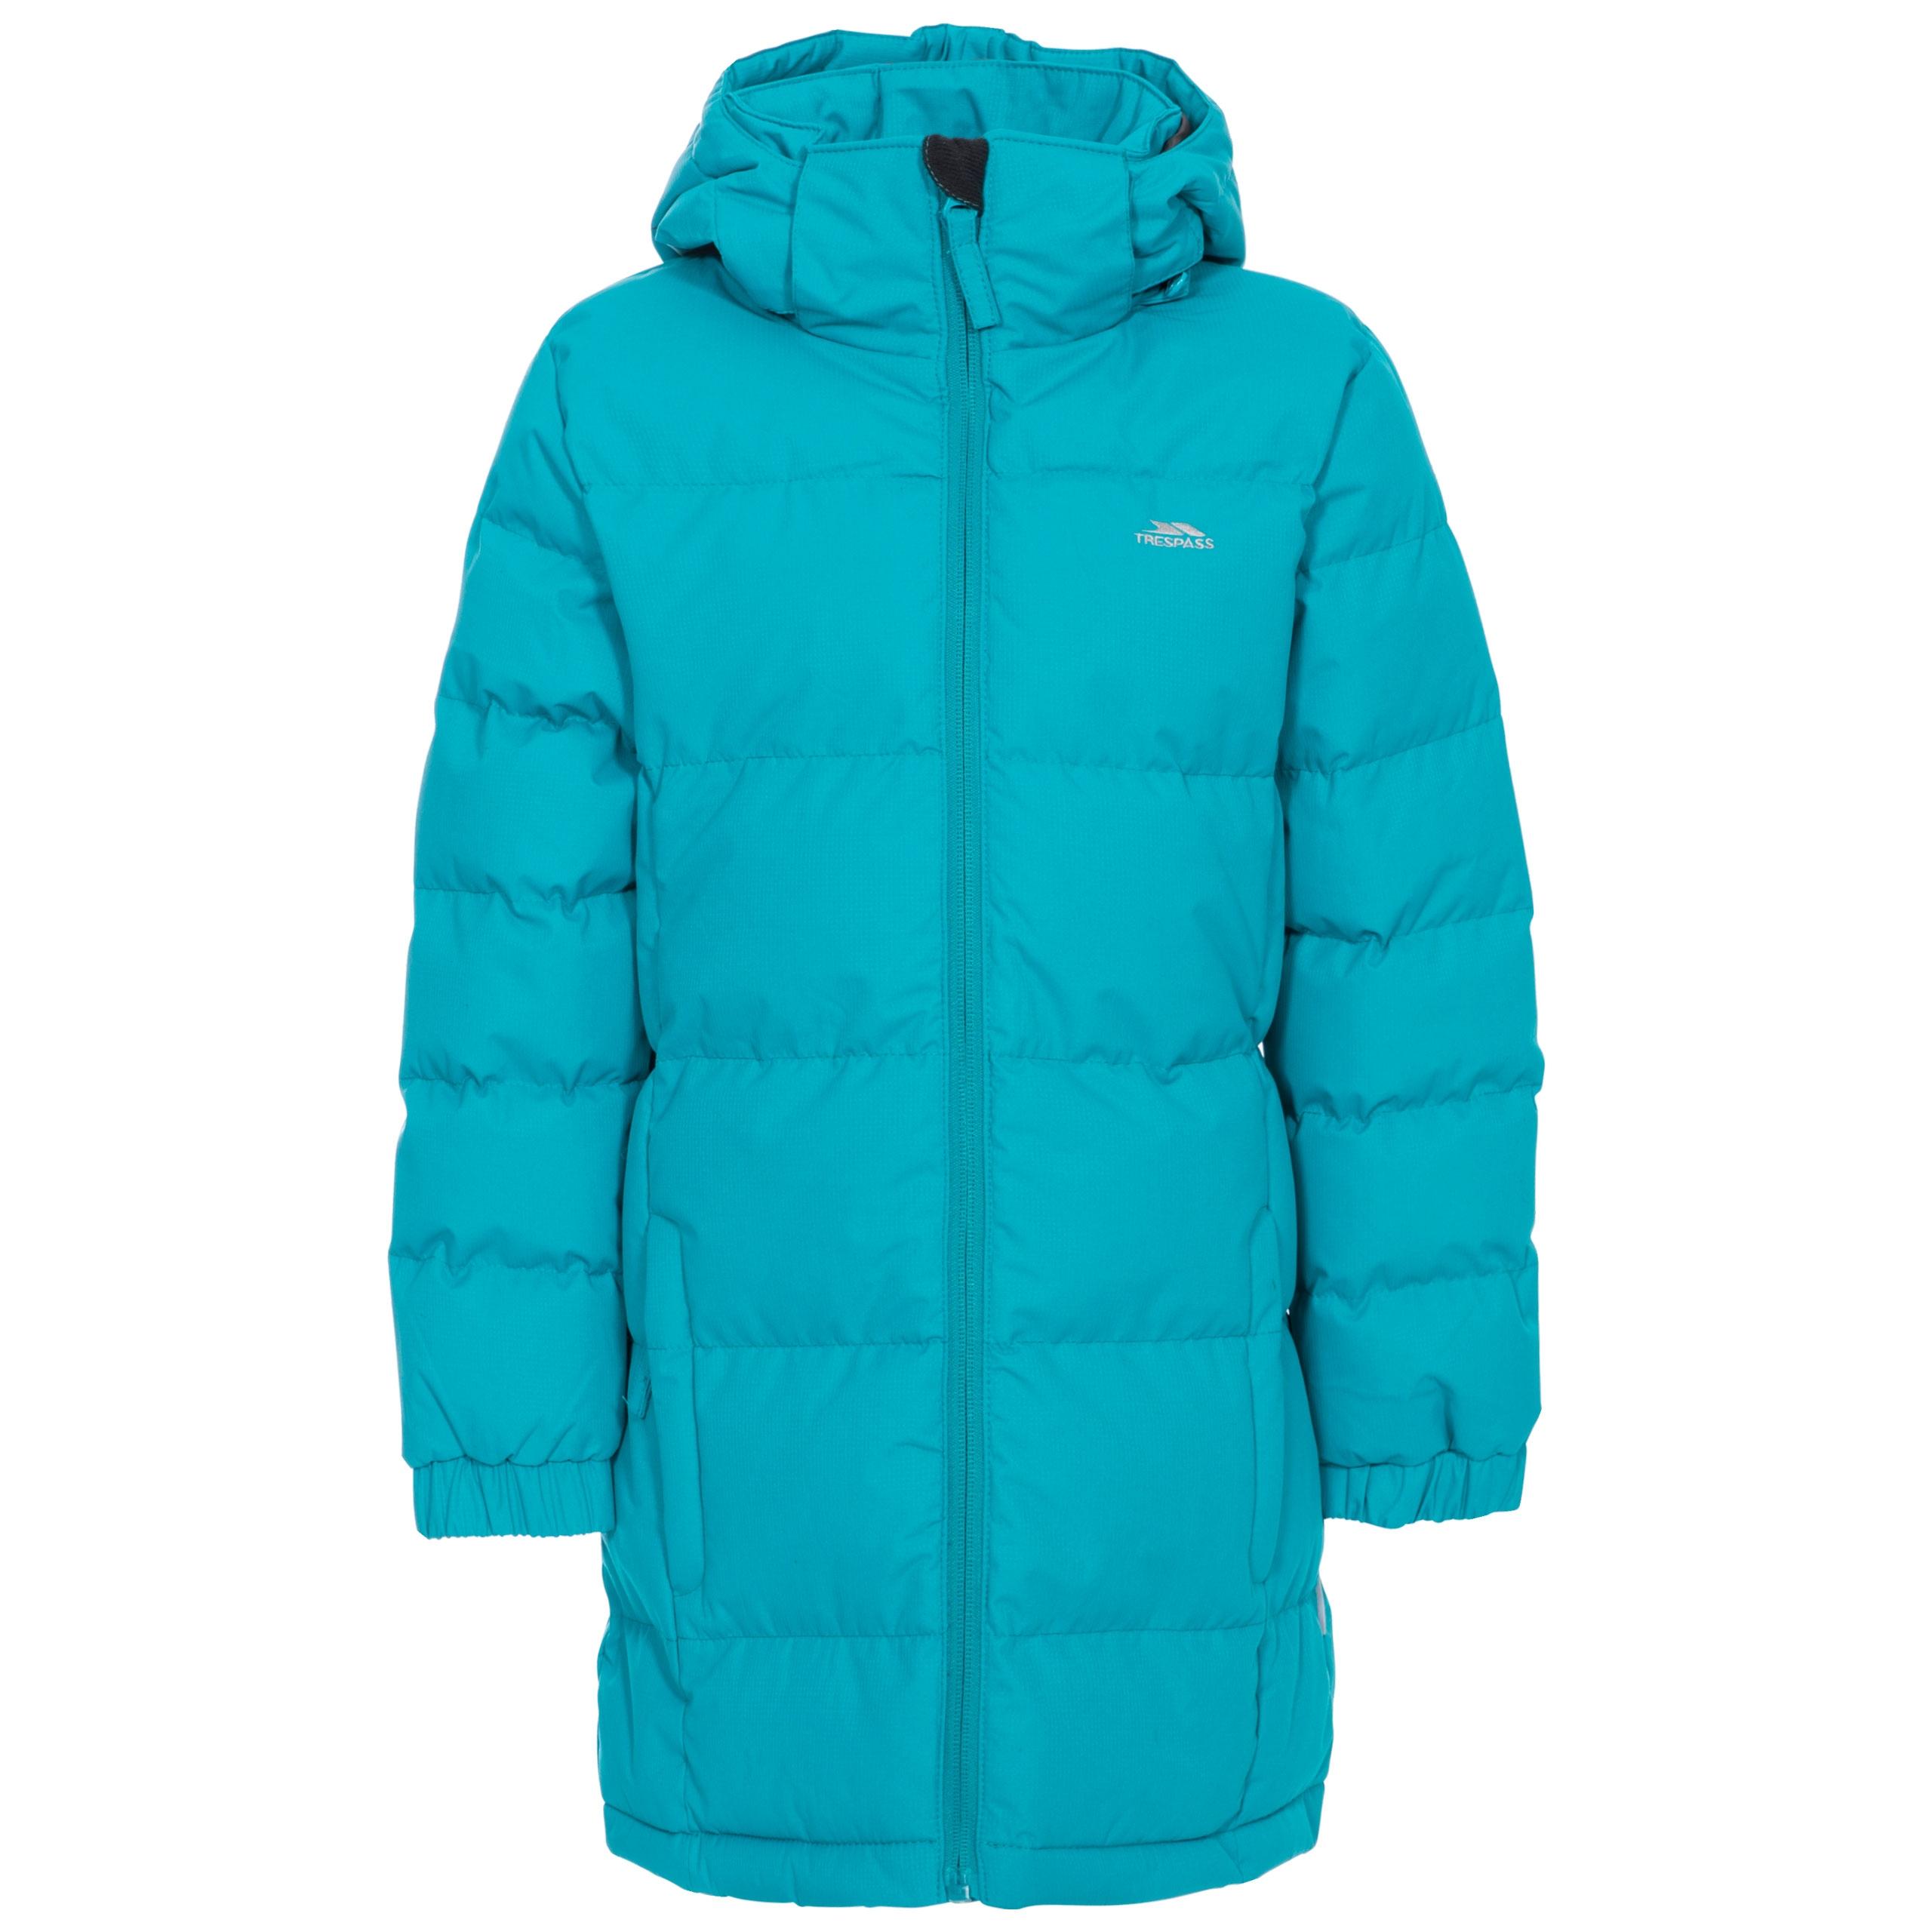 Trespass-Tiffy-Girls-Winter-Coat-Padded-Casual-Longer-Length-amp-Insulated-Jacket thumbnail 15